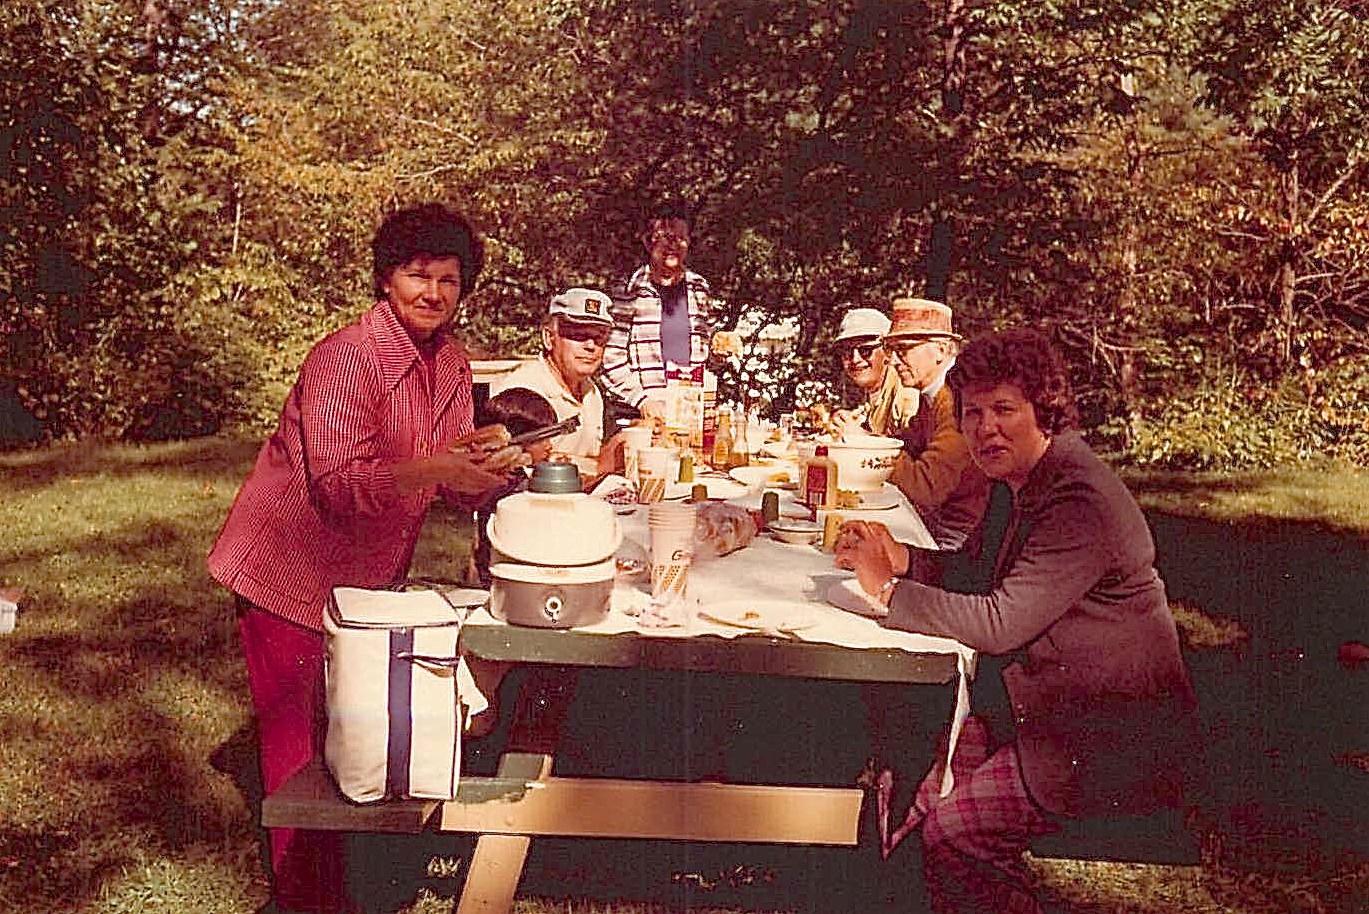 Helen Bednarski, Al Gudas, Mayme, Stanley Baldyga, Andy Bednarski, Eleanor Gudas 1976 Tuscarora Lake